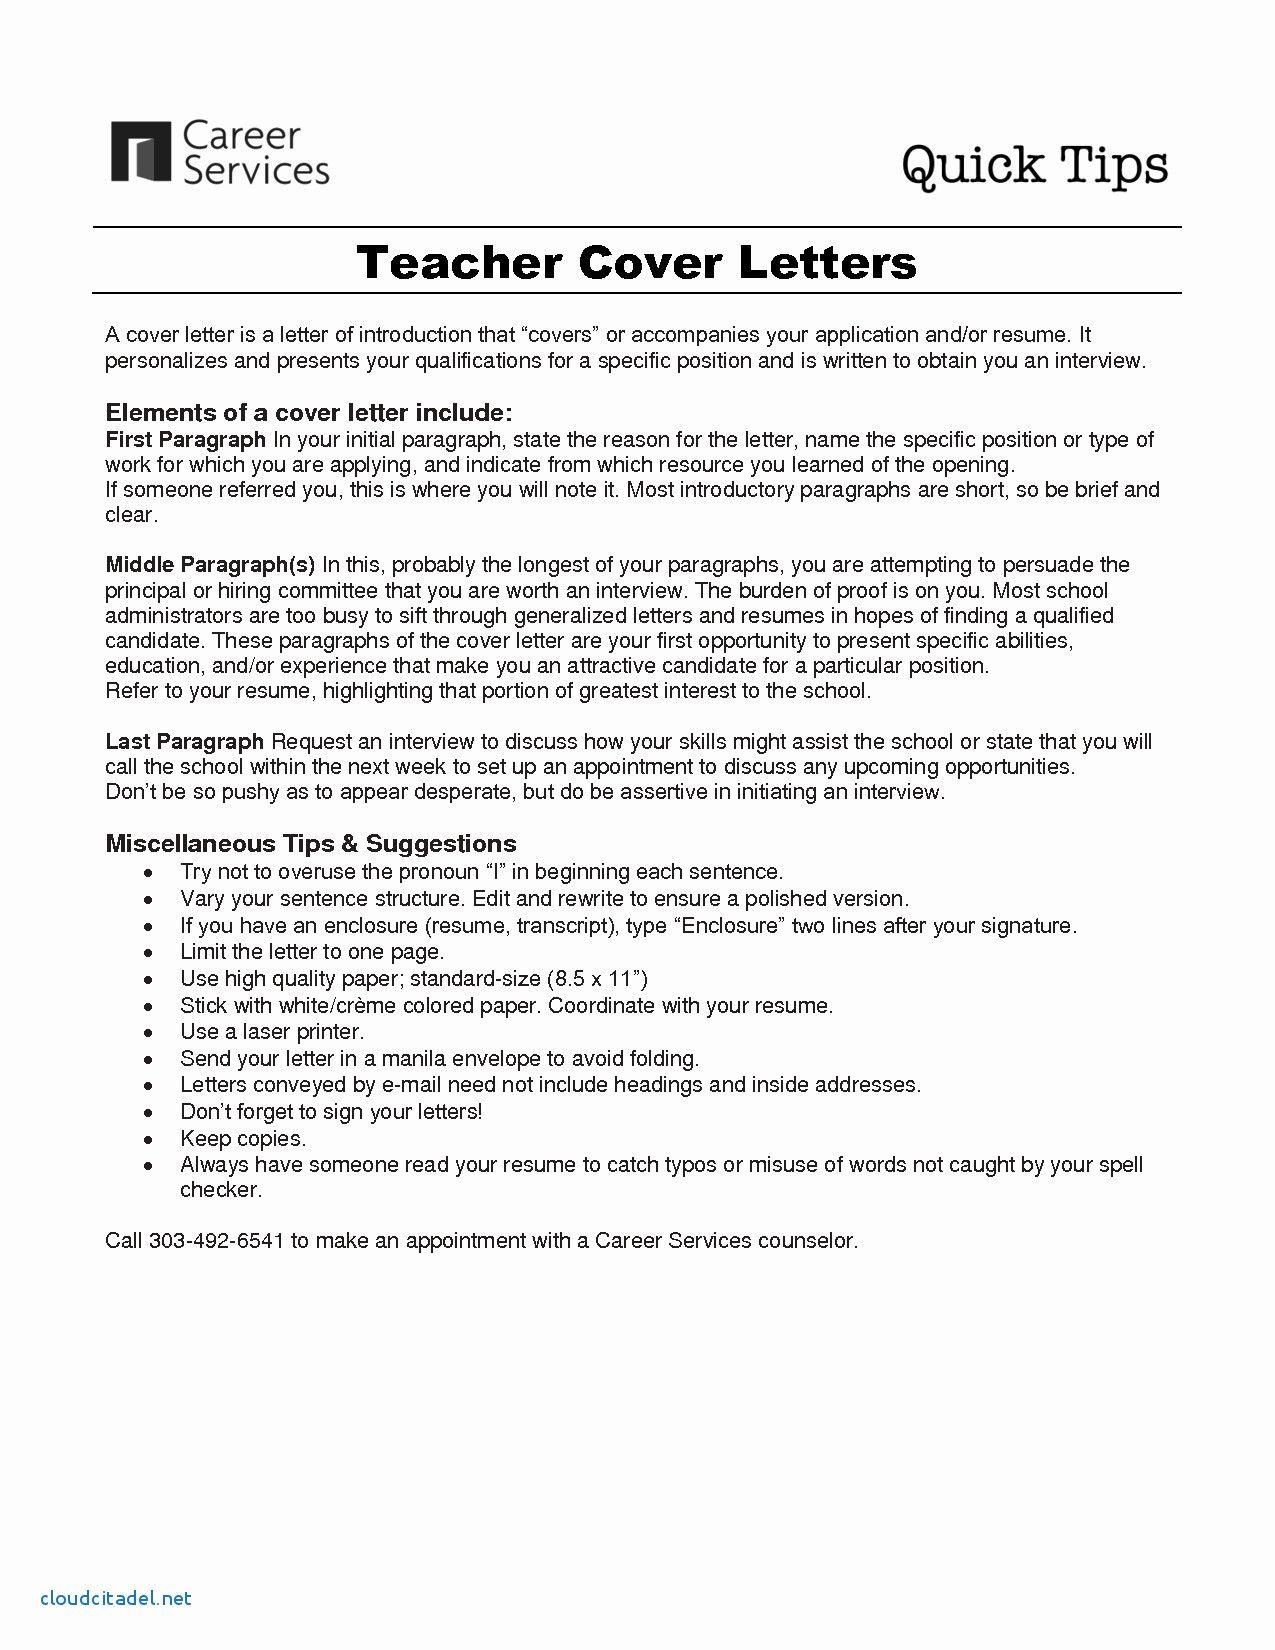 3 Paragraph Cover Letter Template Teaching Cover Letter Teacher